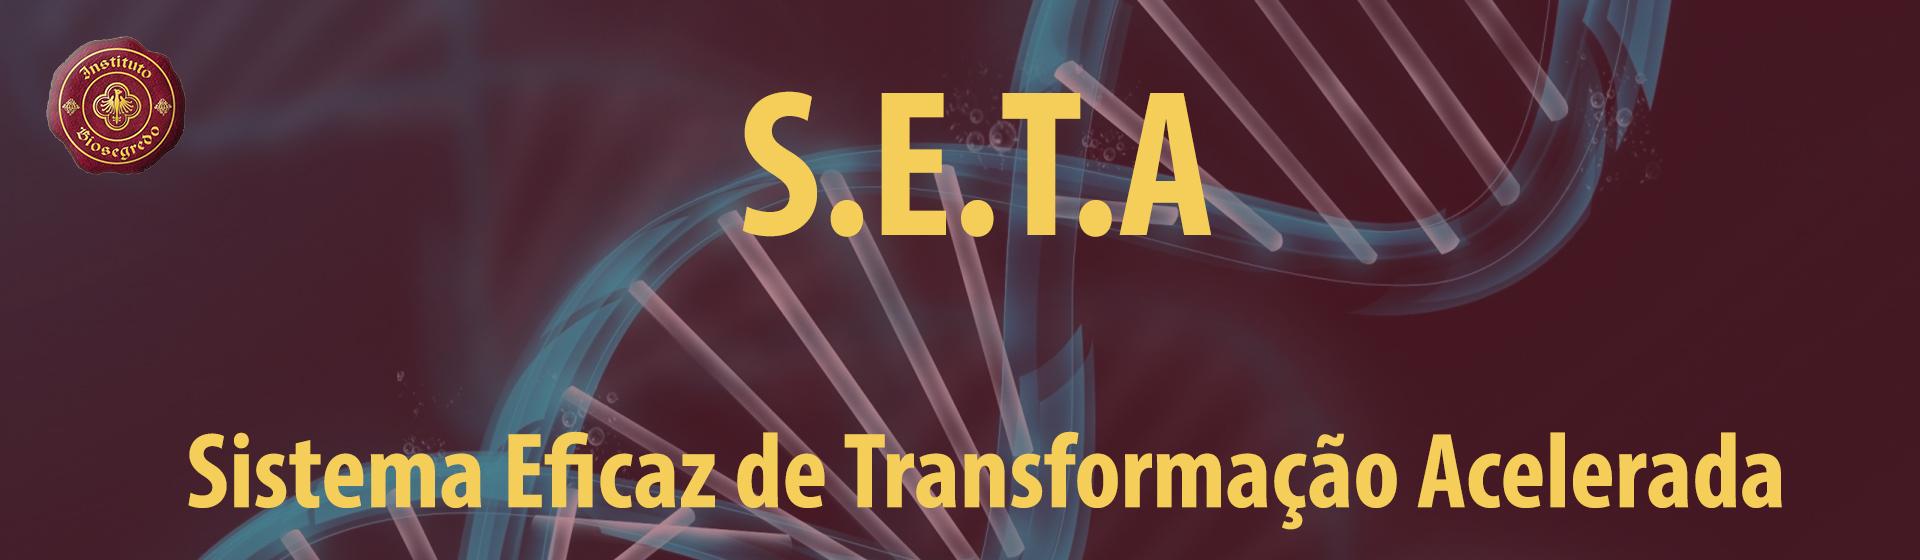 Seta%201920x560